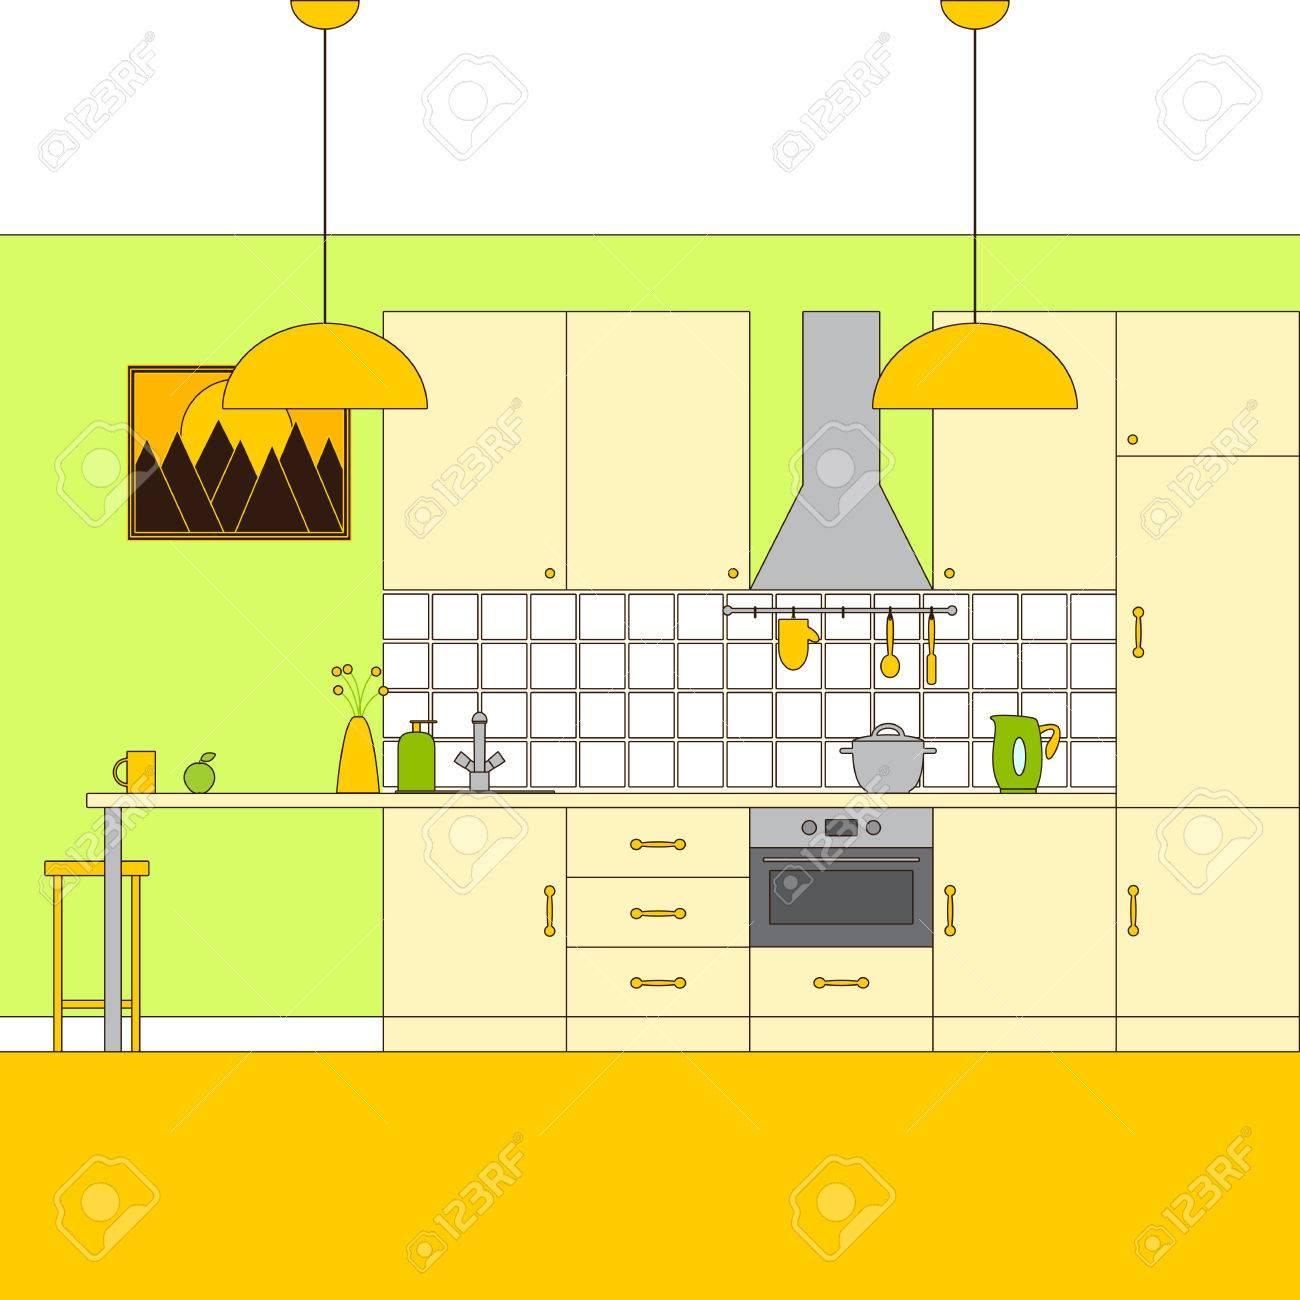 Mobili Incasso Cucina. Amazing Ikea Tavoli Da Giardino Ikea Mobili ...